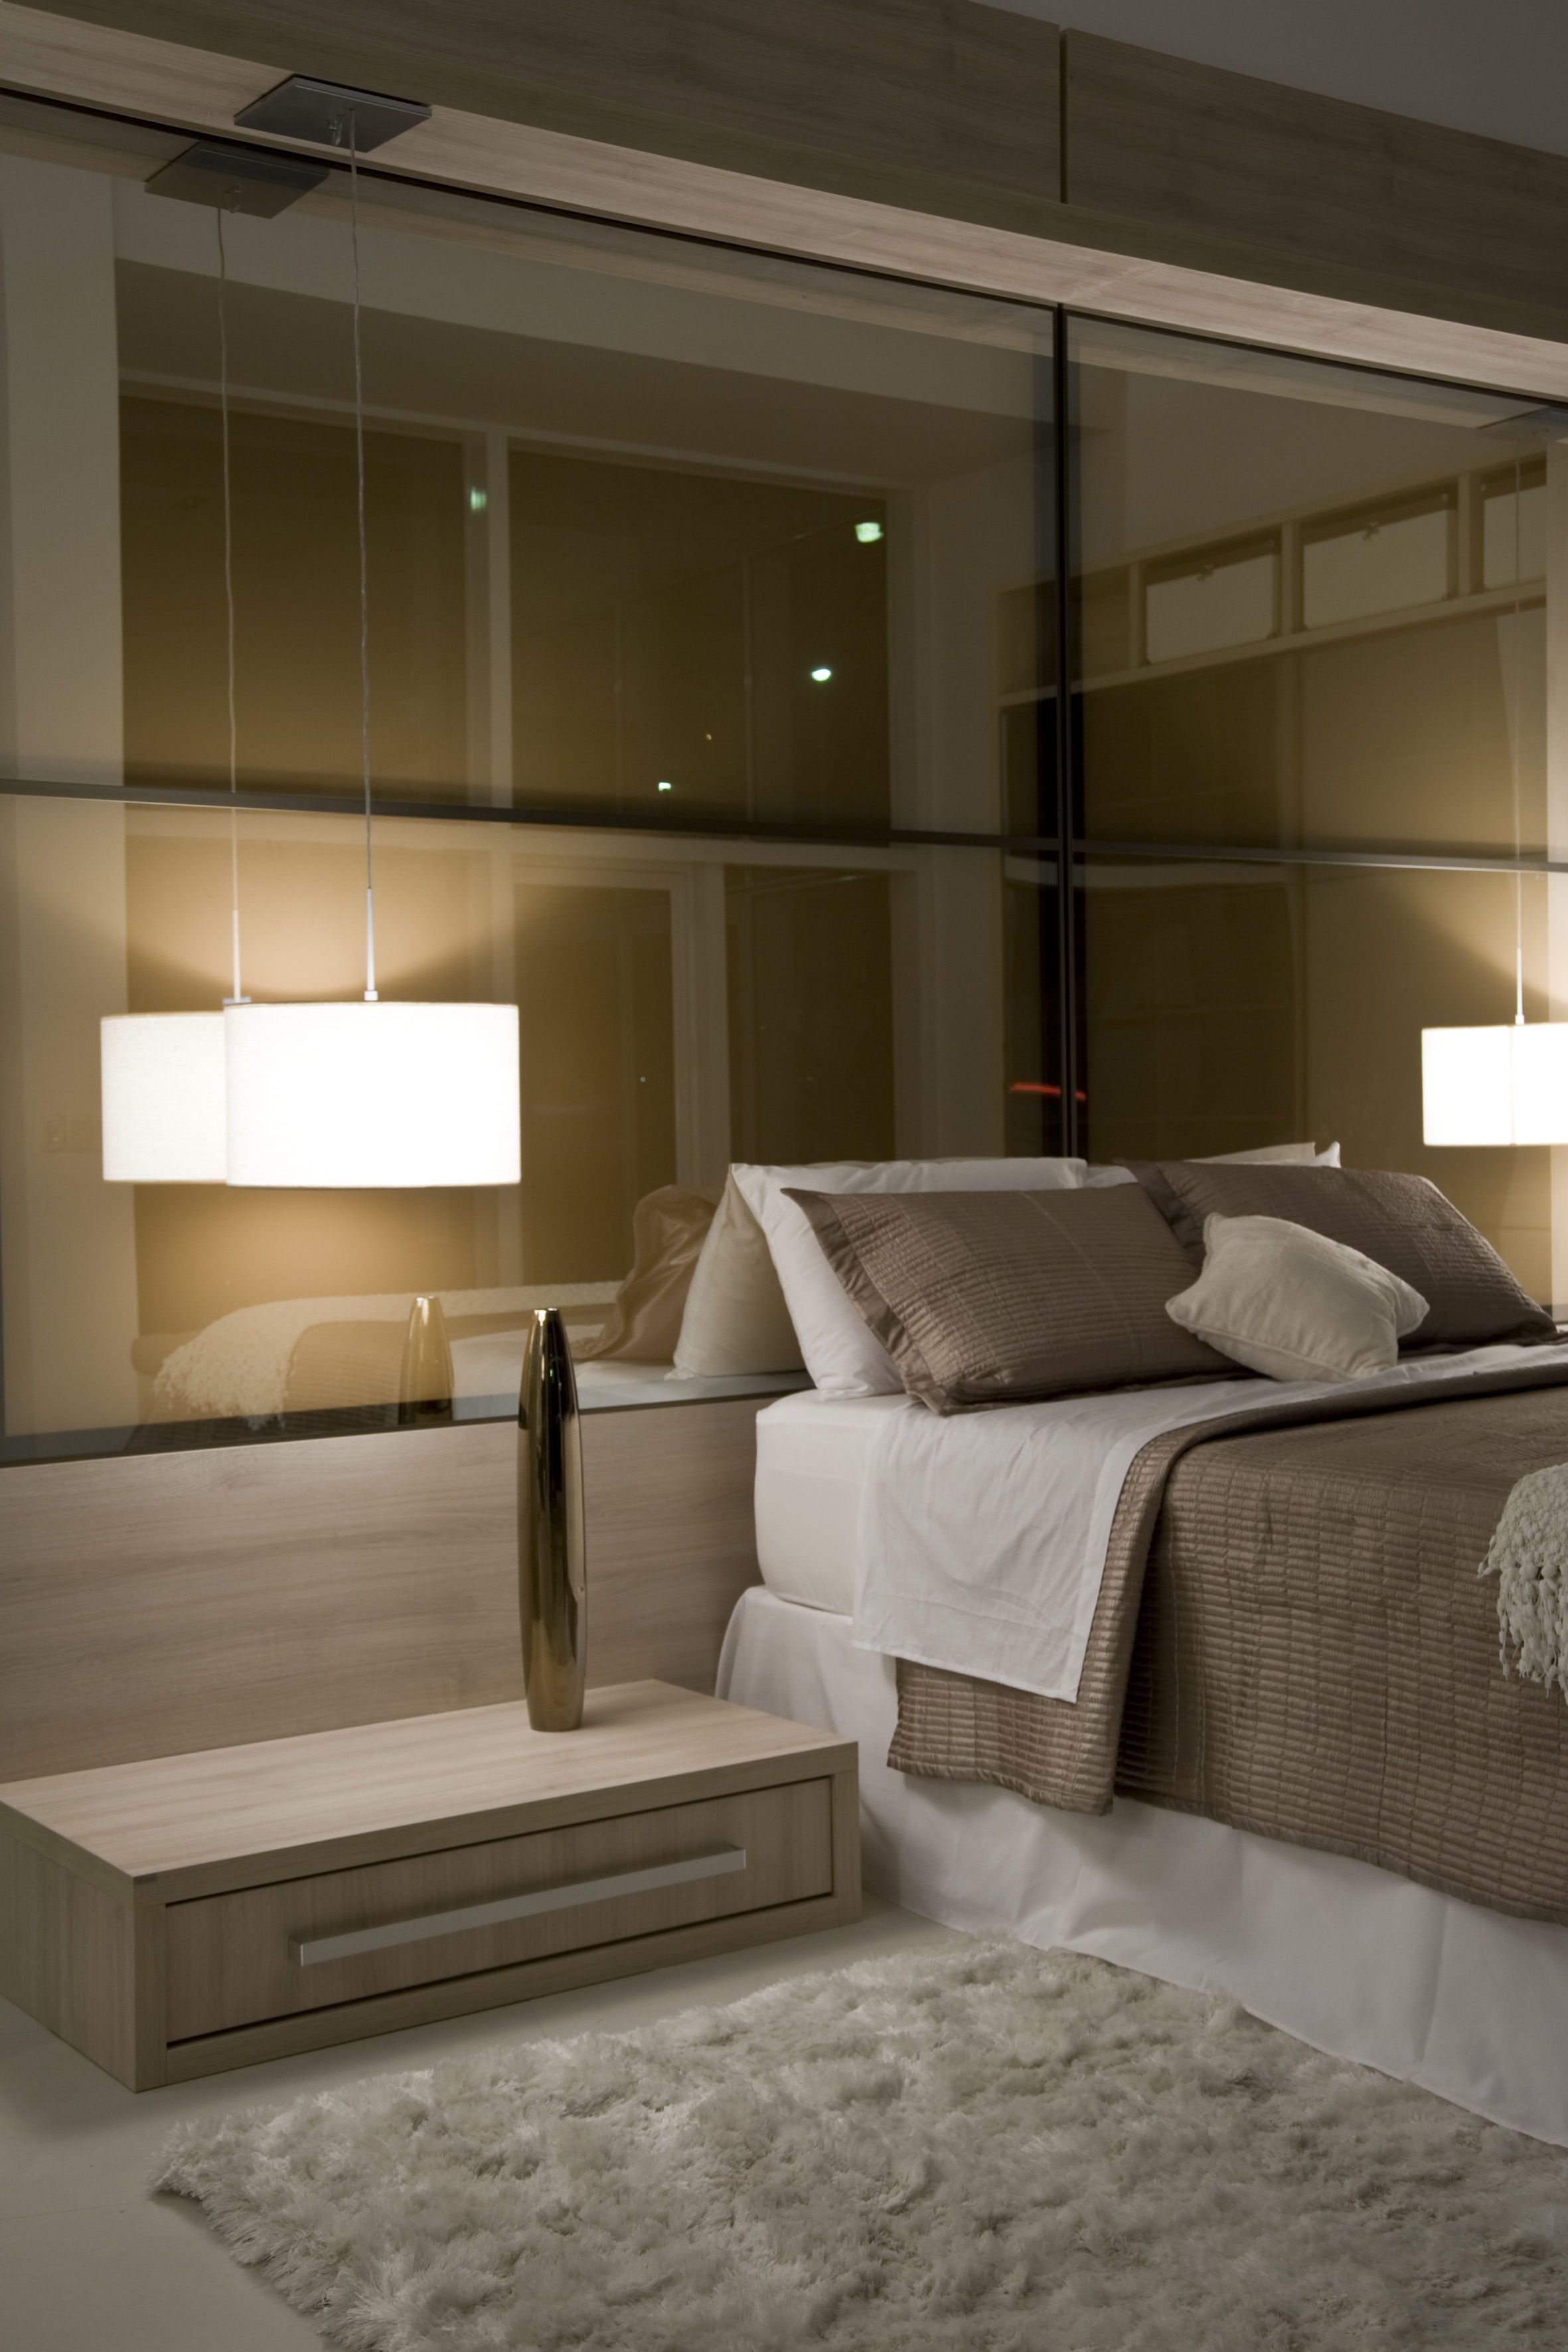 Bedroom lights ideas   Astonishing Useful Tips False Ceiling Design Gypsum false ceiling